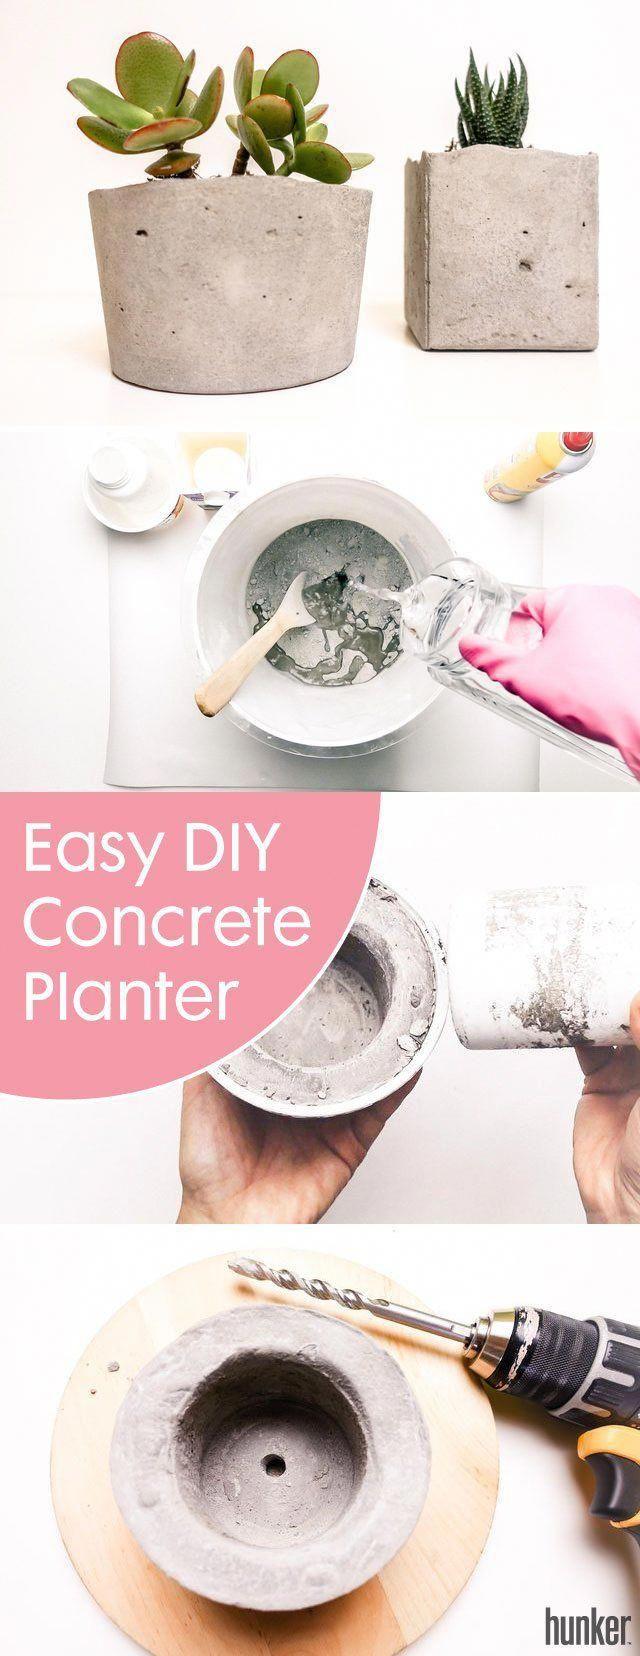 Easy DIY: Modern Succulent Planter Using Concrete